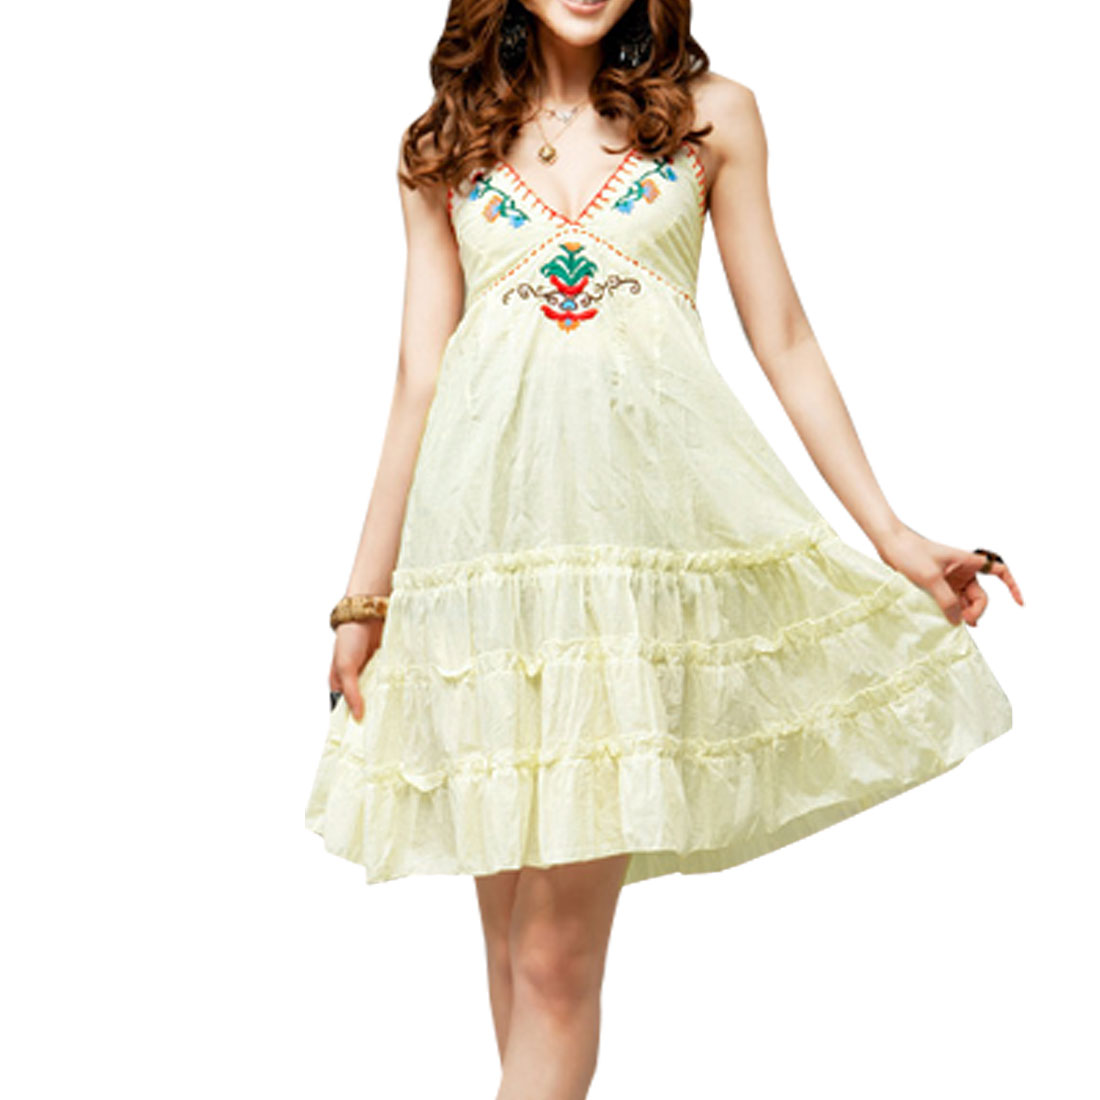 Lady Embroidery Decor Front Deep V Neck Backless Ivory Dress XS